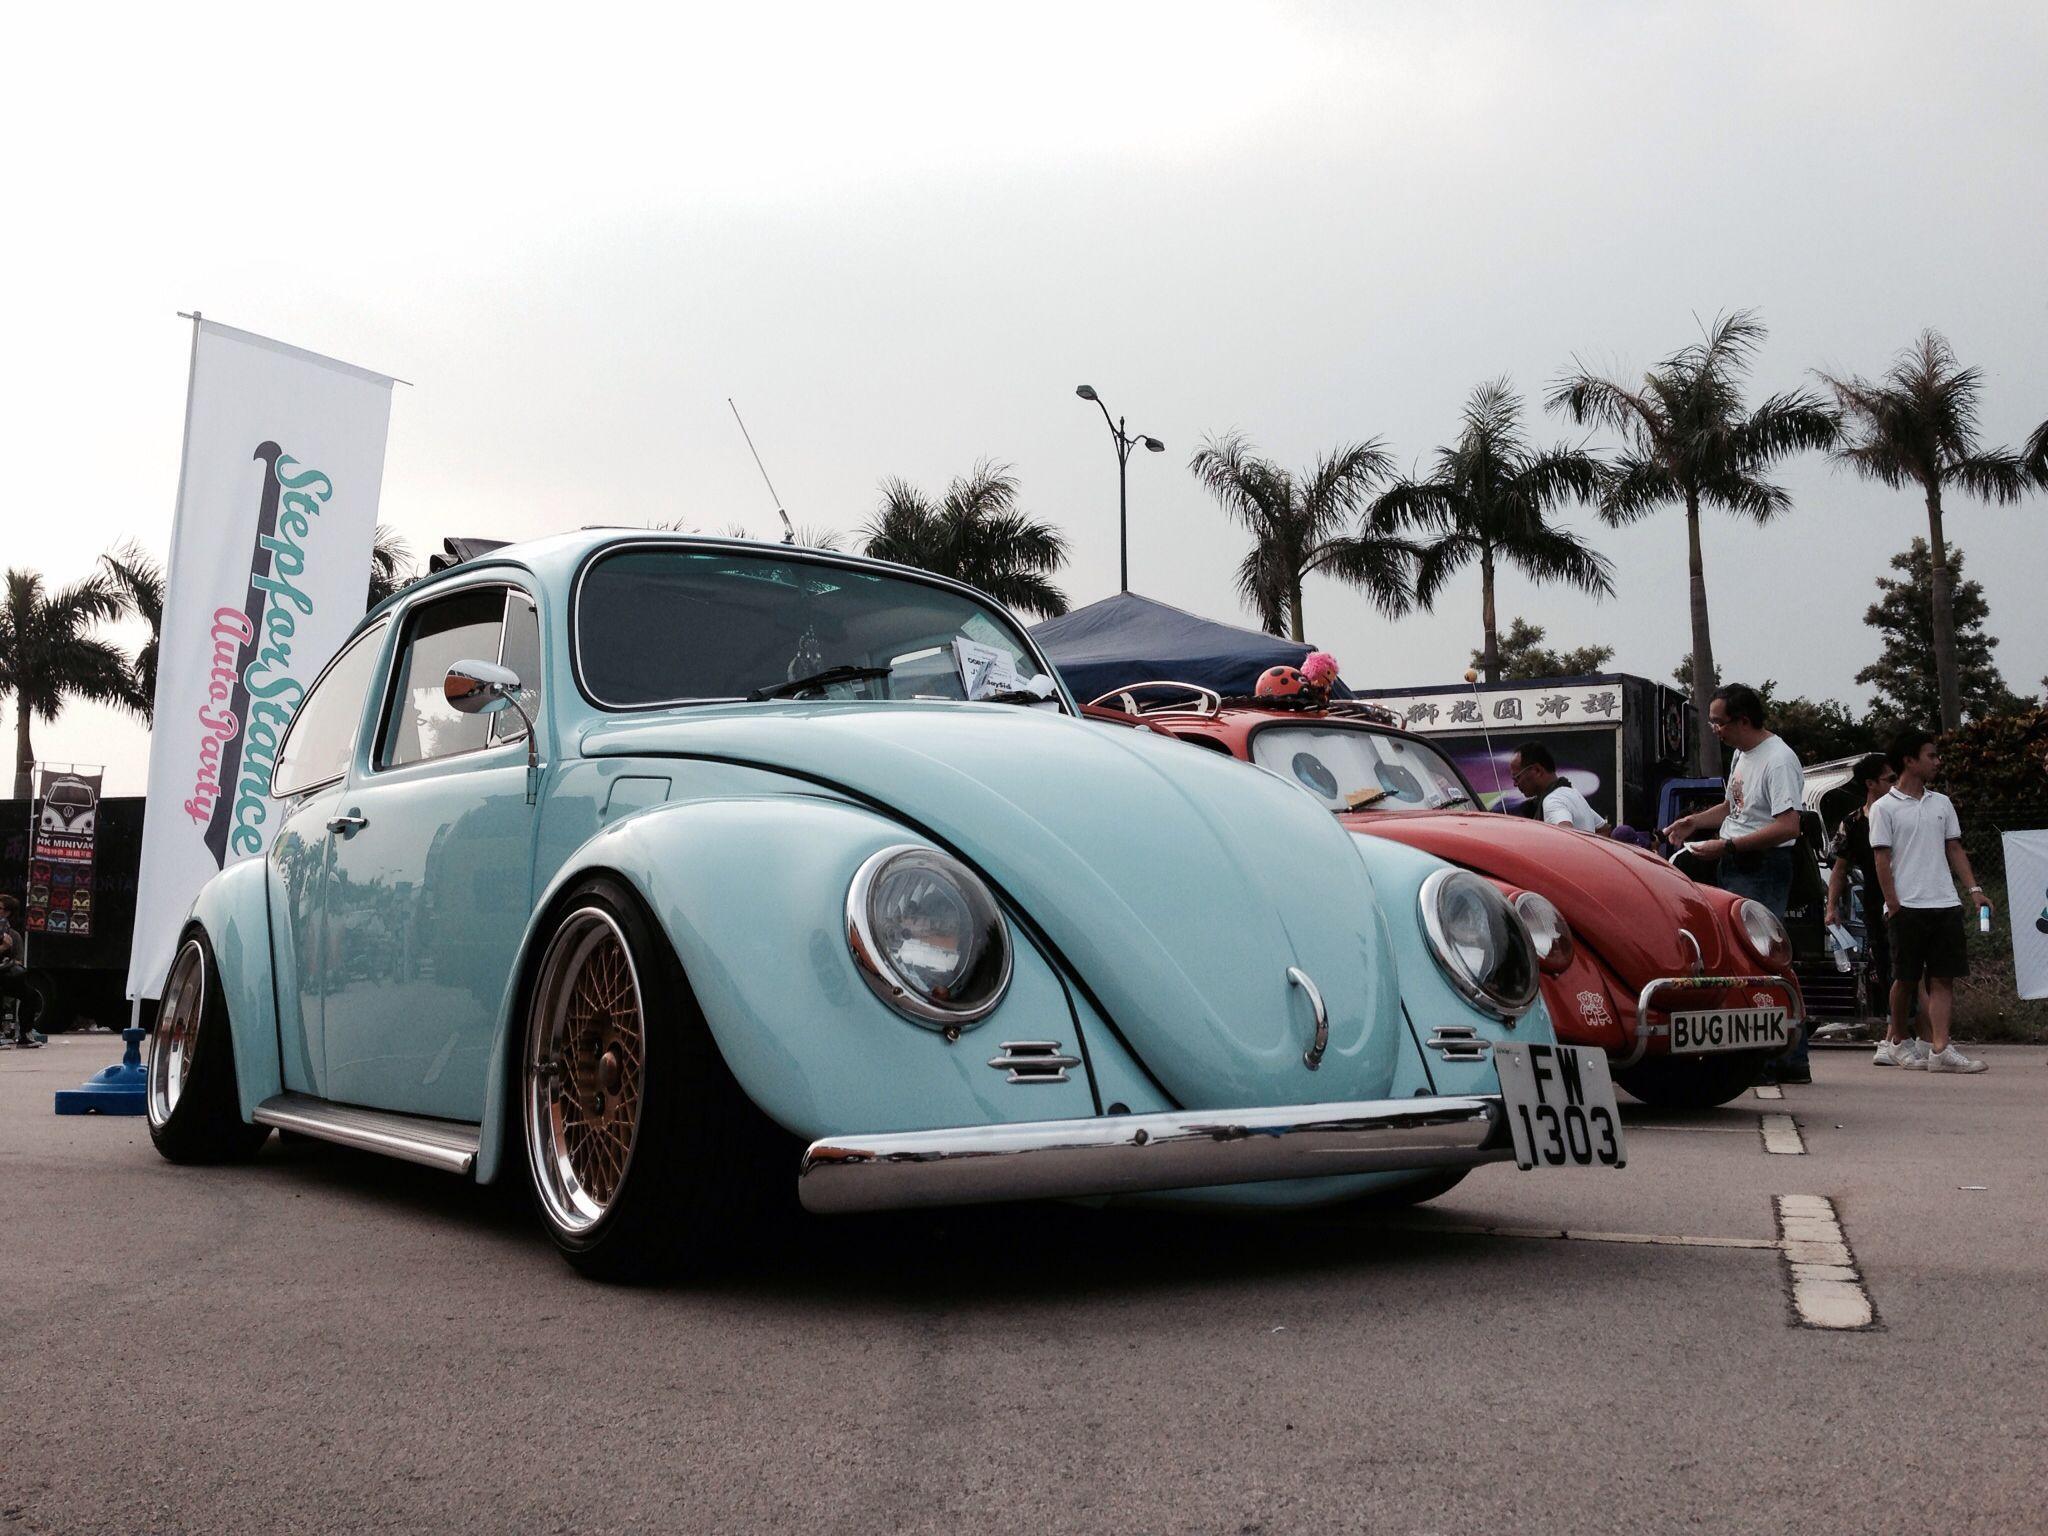 Wv hong kong Snap shot for wheels Pinterest